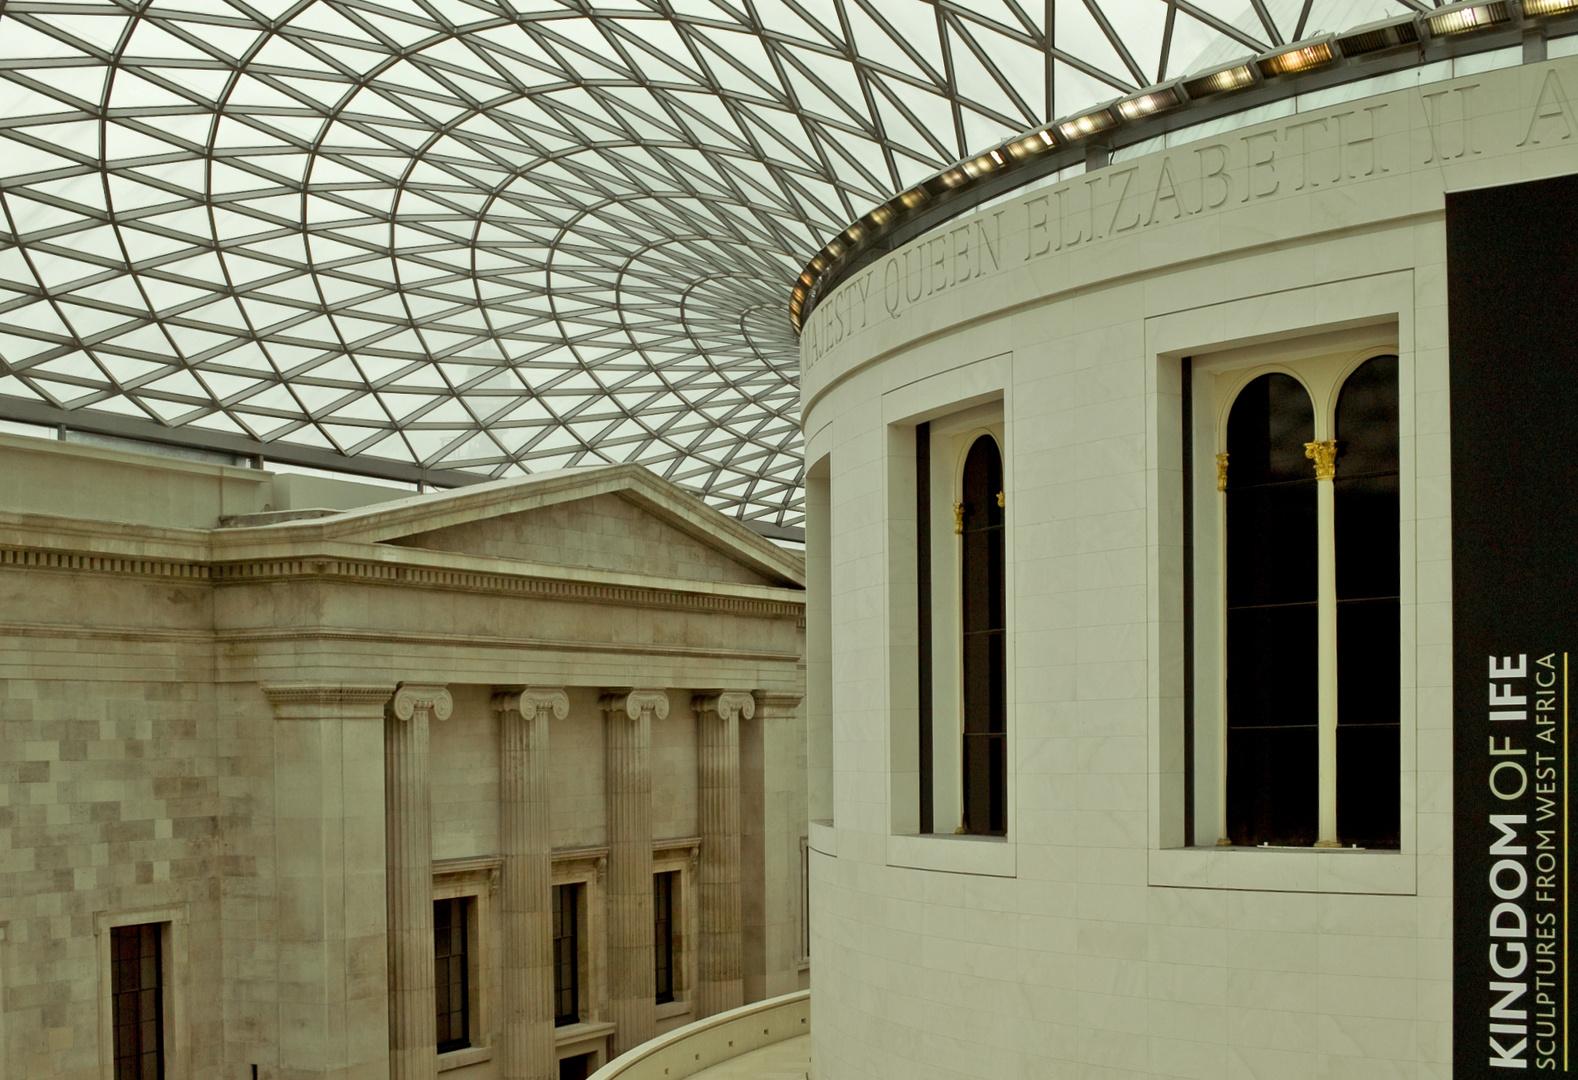 London - Britisches Museum